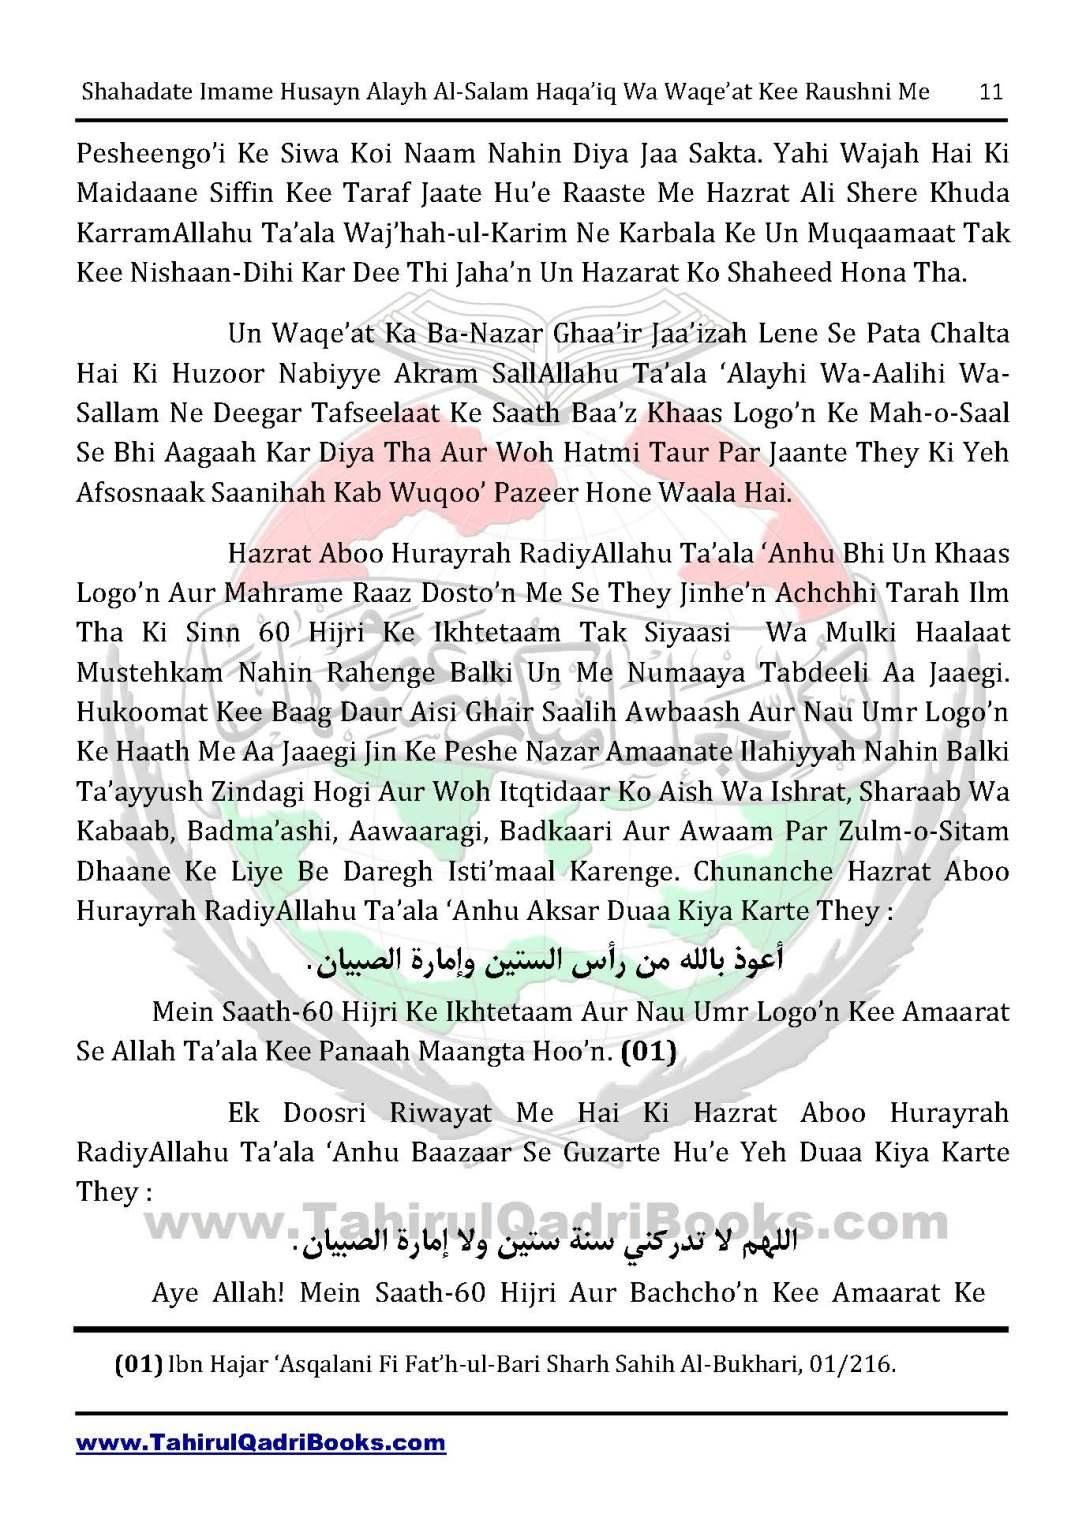 shahadate-imame-husayn-alayh-is-salam-haqaiq-wa-waqe_at-kee-raushni-me-in-roman-urdu-unlocked_Page_11